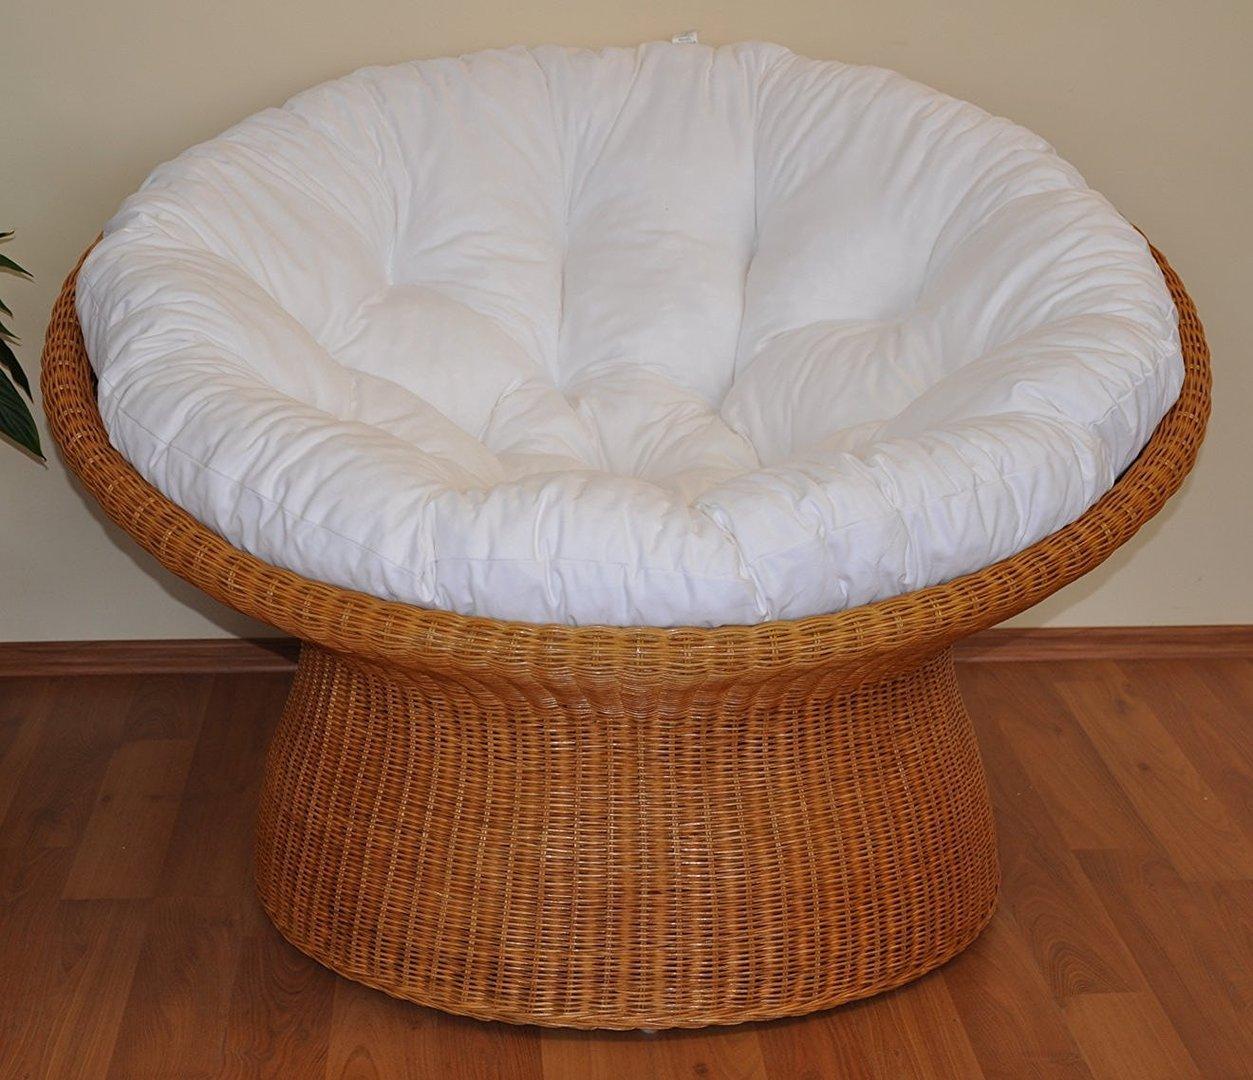 rattan papasan sessel dichtgeflochten fb honig rattan xxl. Black Bedroom Furniture Sets. Home Design Ideas